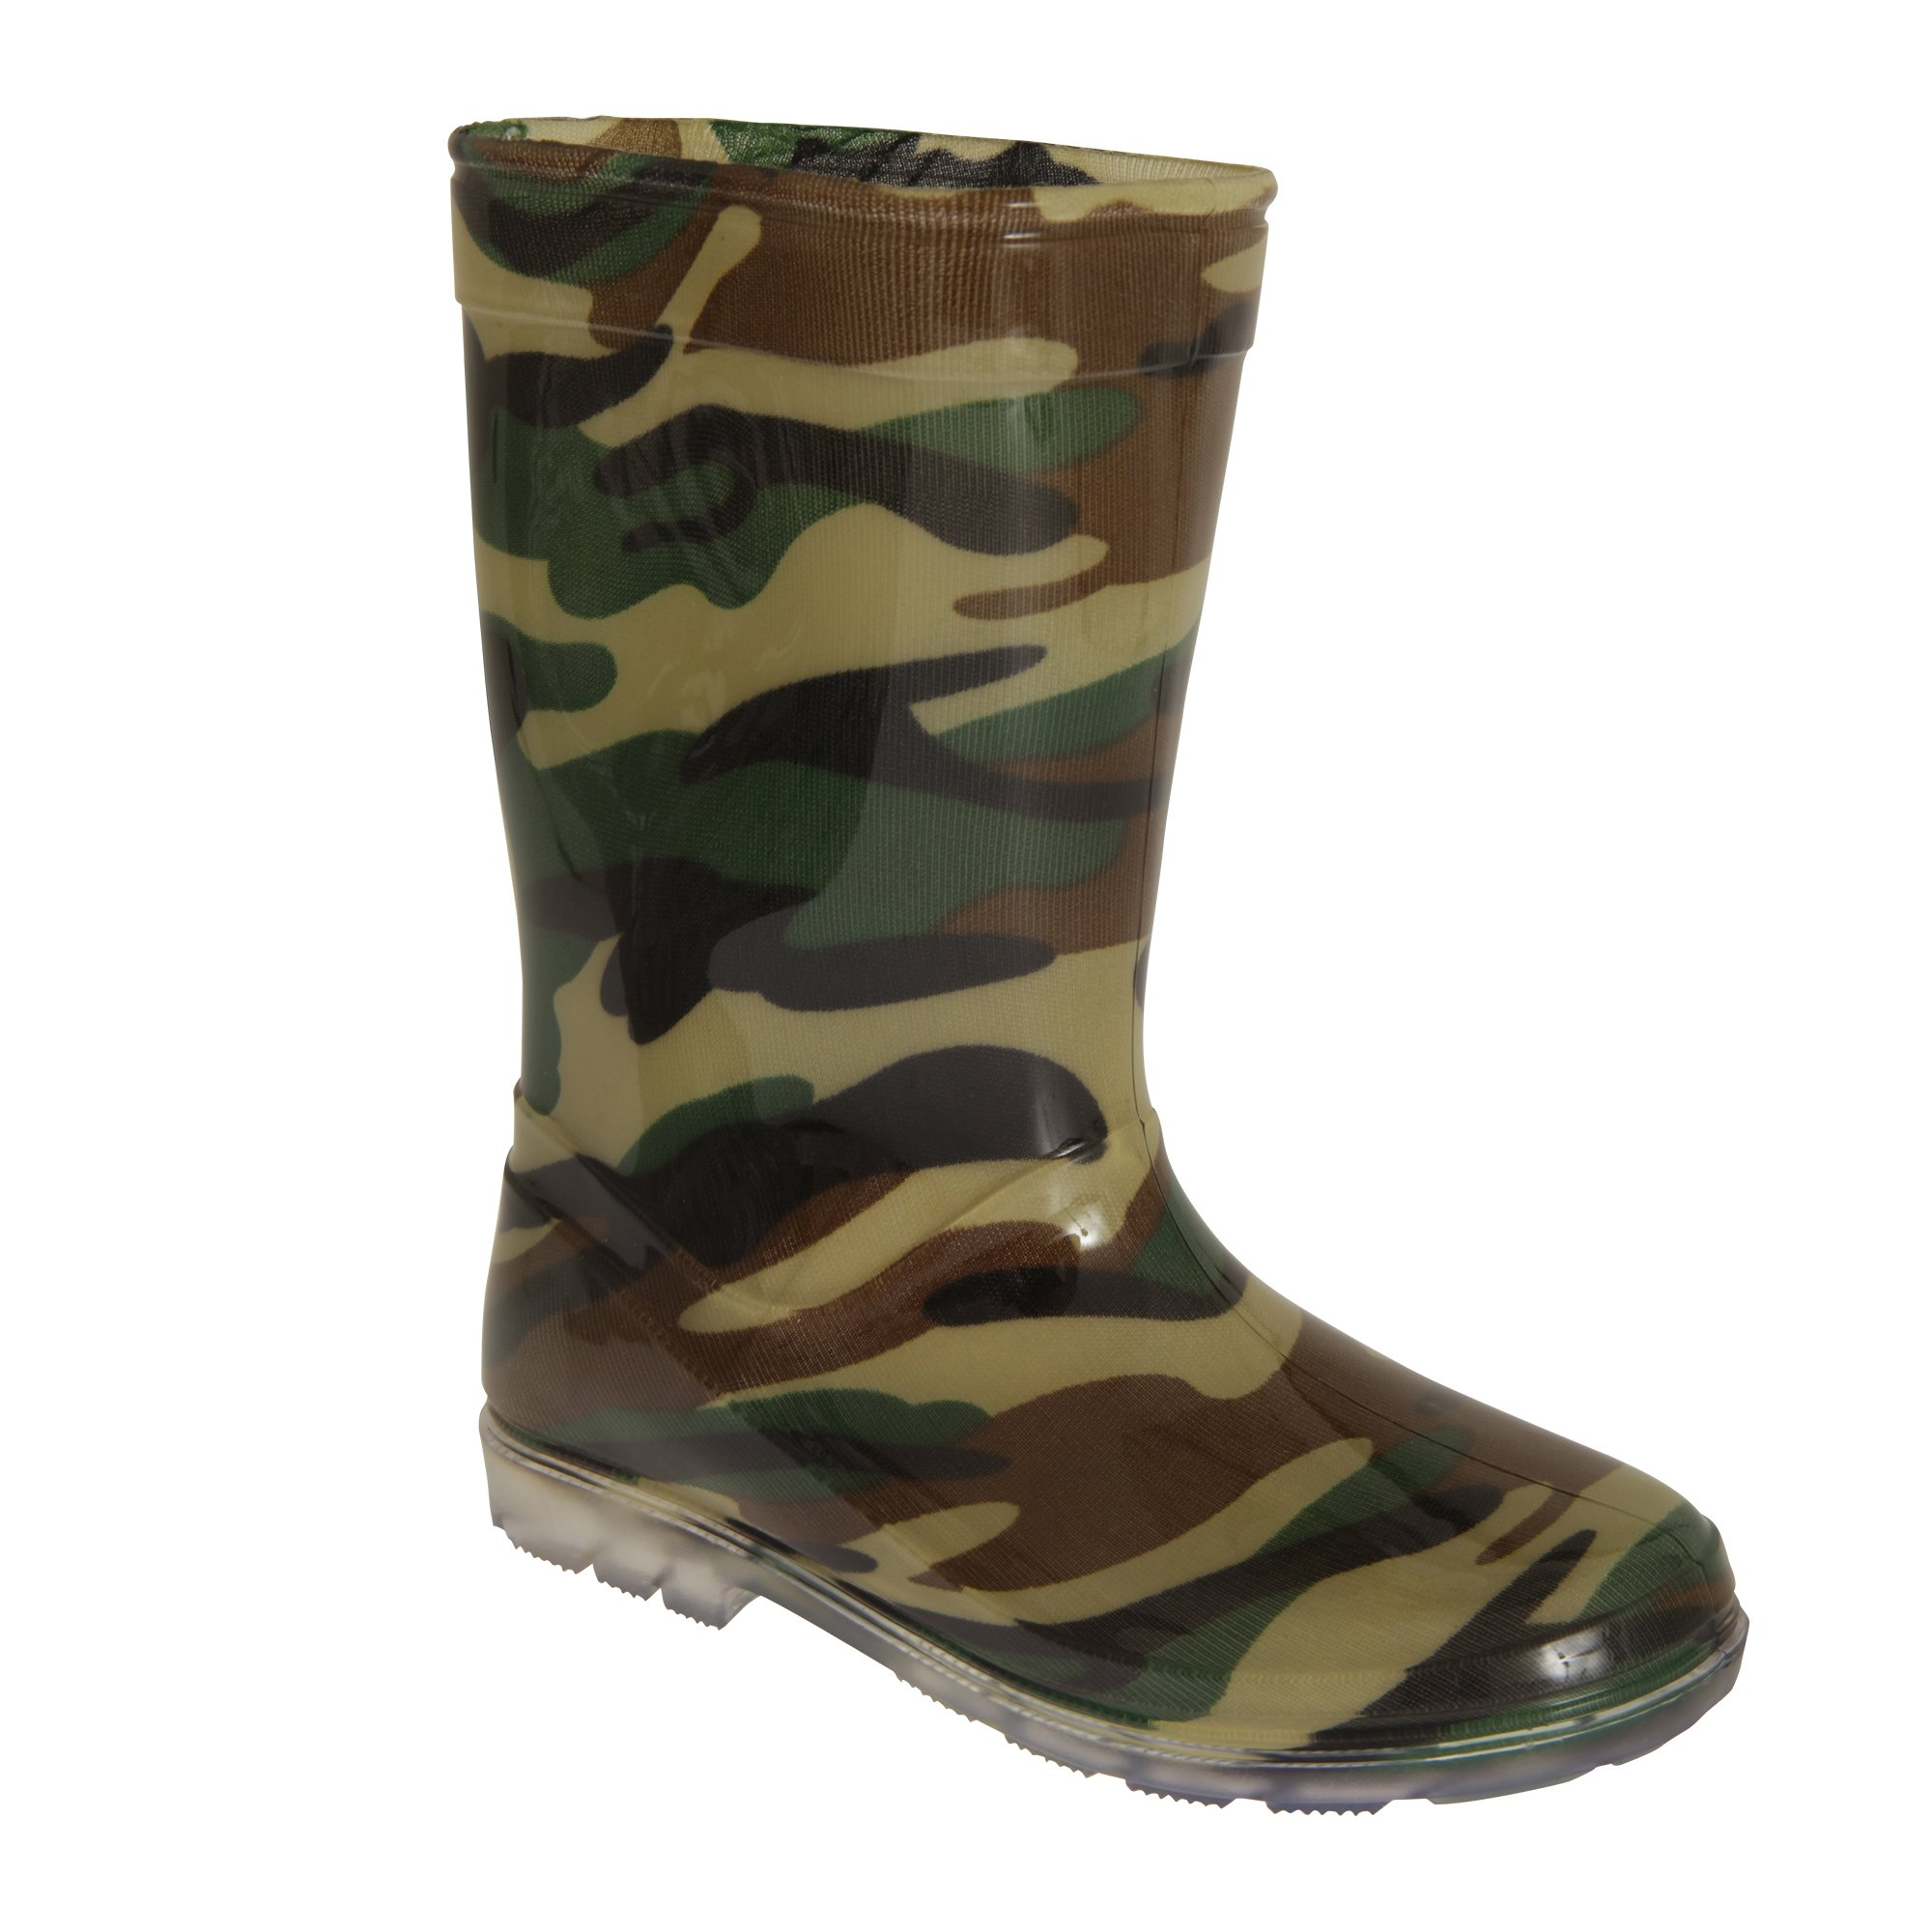 Mudrocks Childrens Boys Camo Pattern PVC Wellington Boots (11 Child US) (Green)